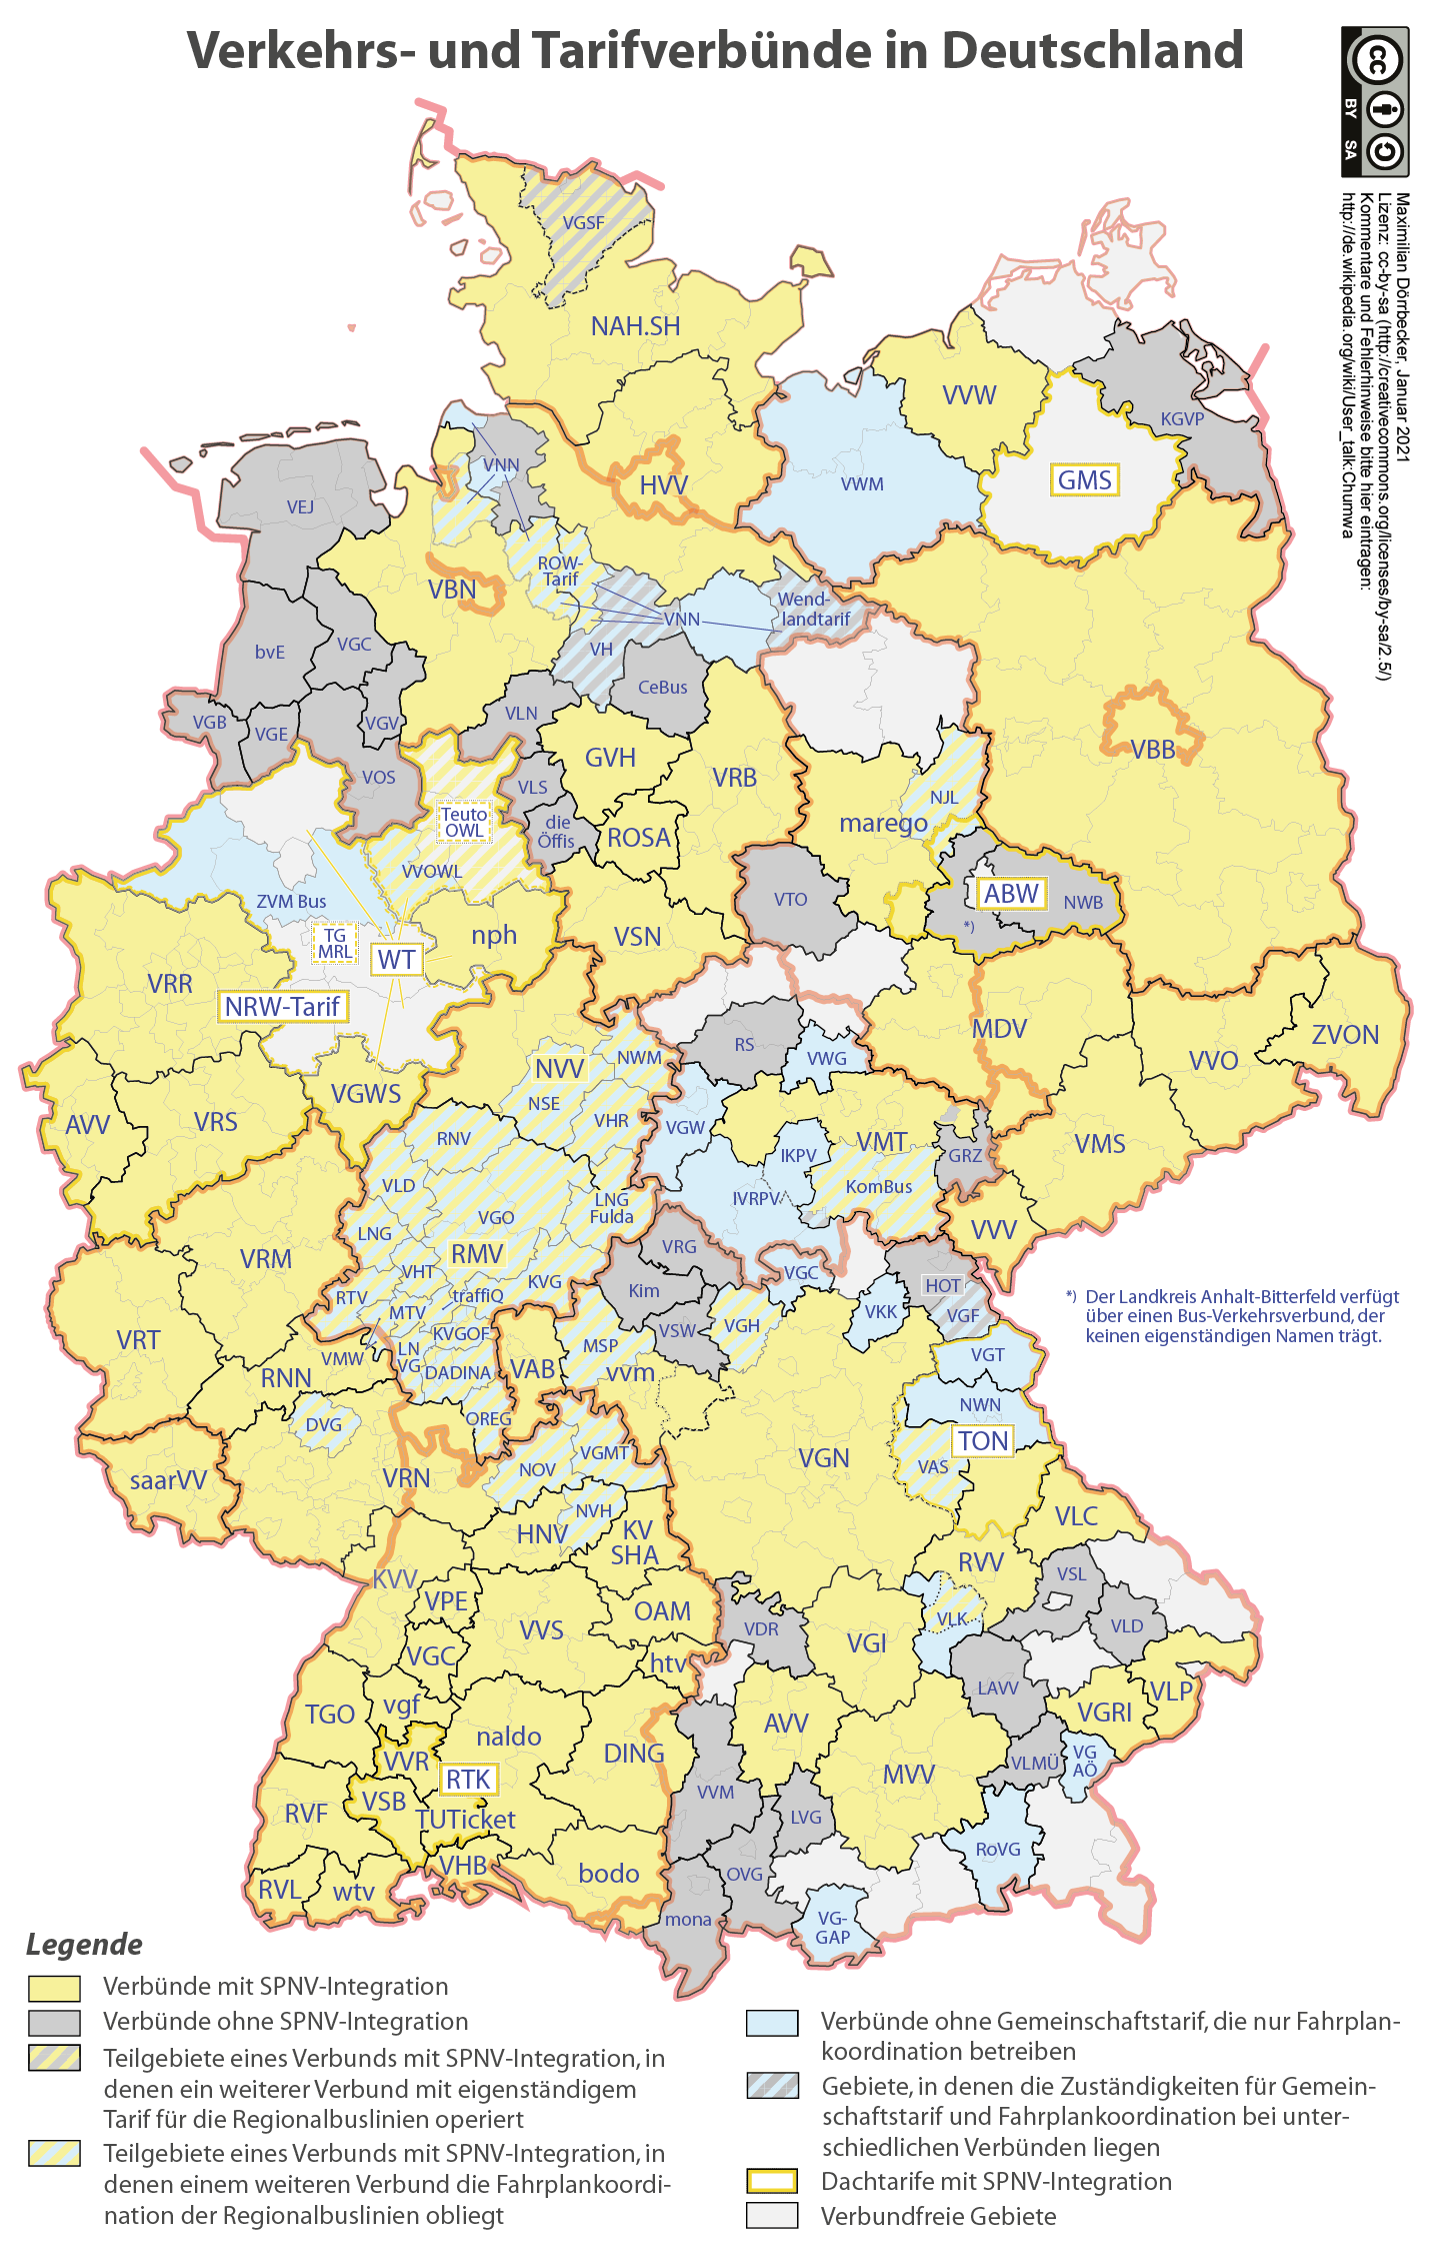 verkehrsverbünde deutschland karte File:Karte der Verkehrsverbünde und Tarifverbünde in Deutschland